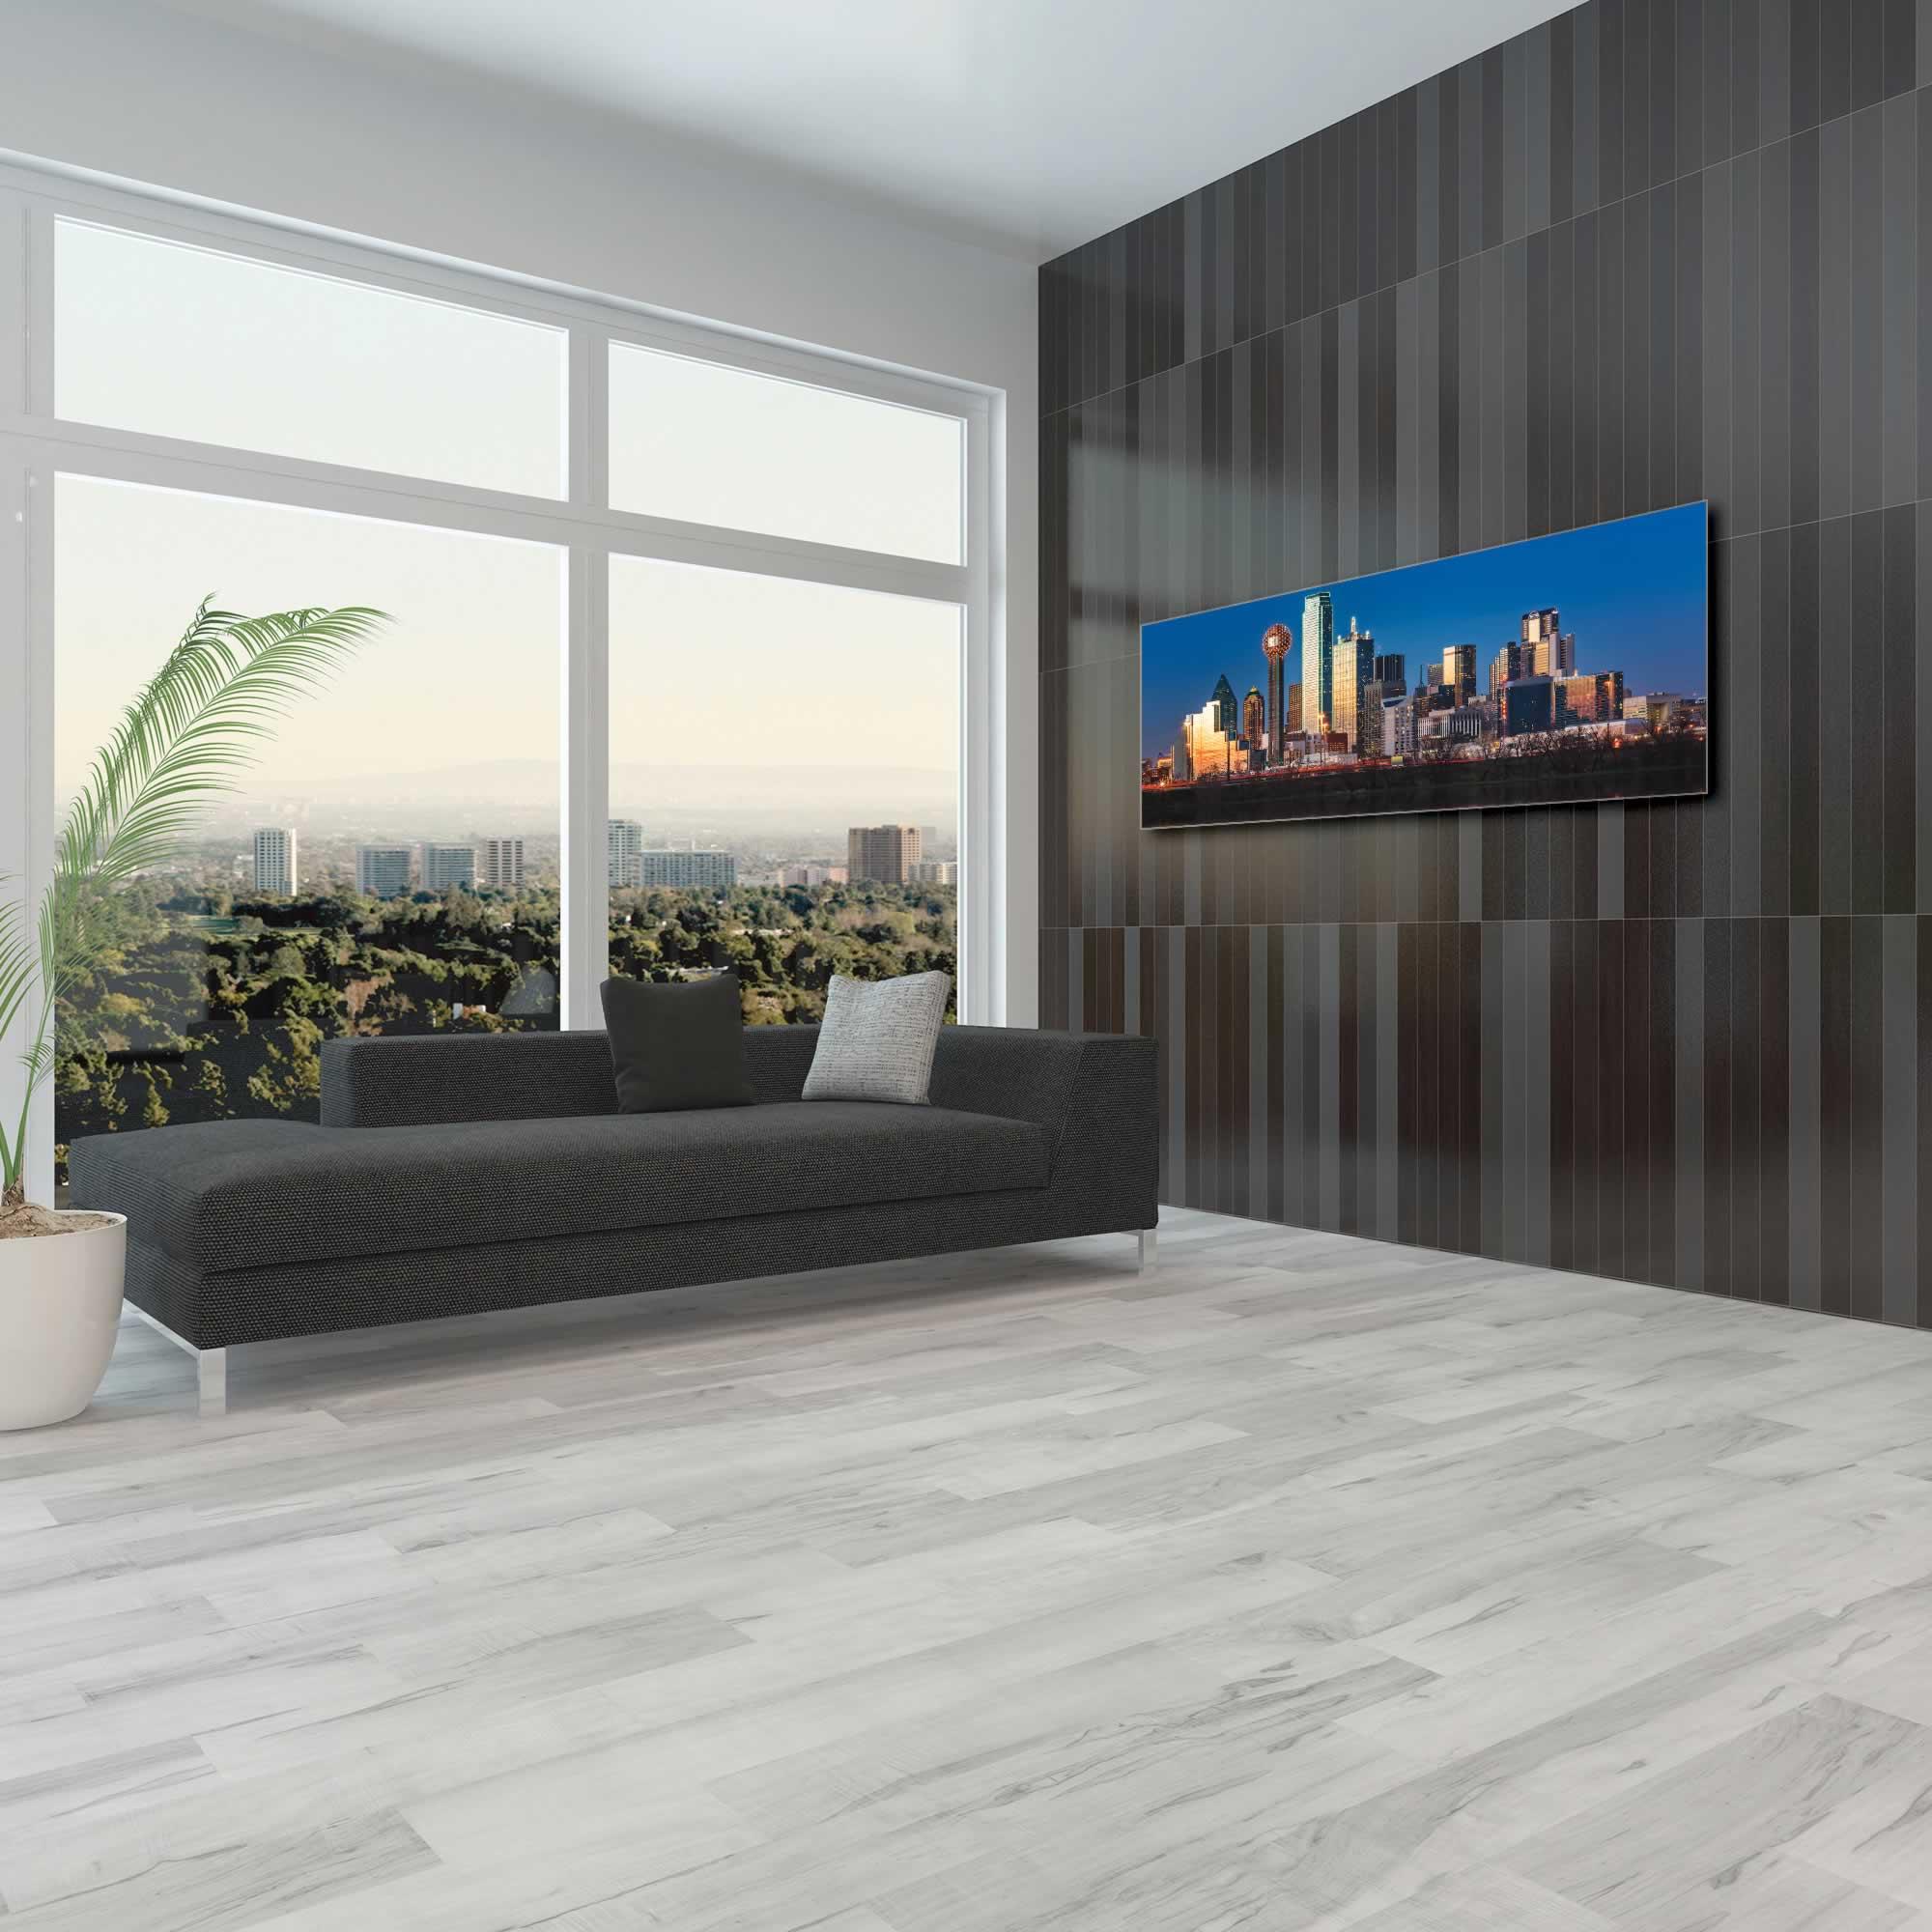 Dallas City Skyline - Urban Modern Art, Designer Home Decor, Cityscape Wall Artwork, Trendy Contemporary Art - Alternate View 1